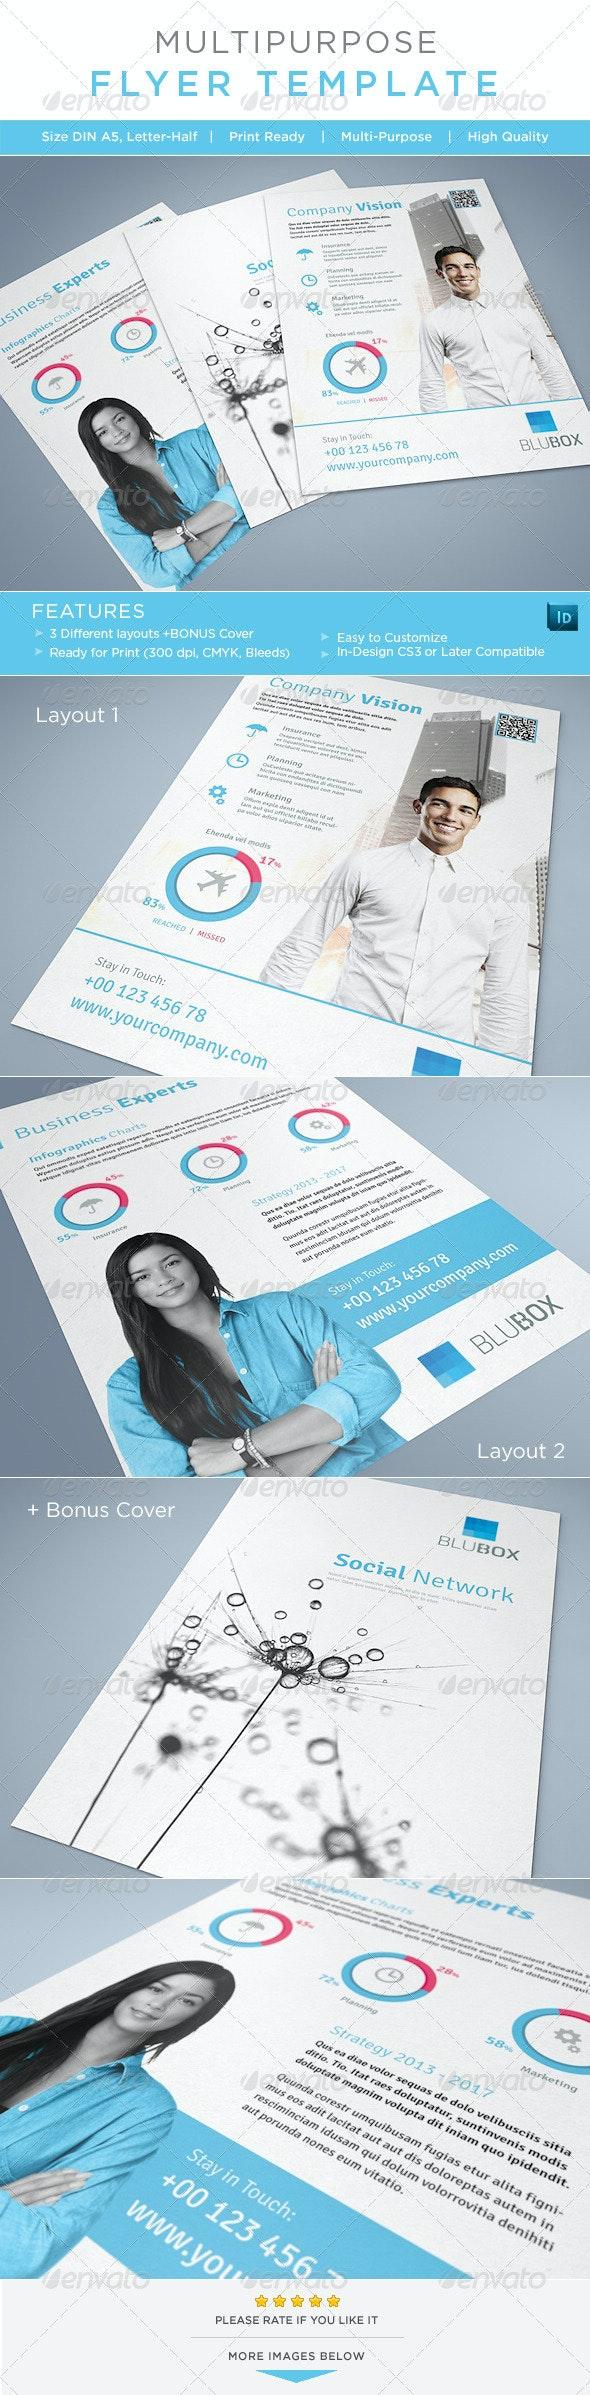 Multipurpose Flyer / AD Template - Corporate Flyers